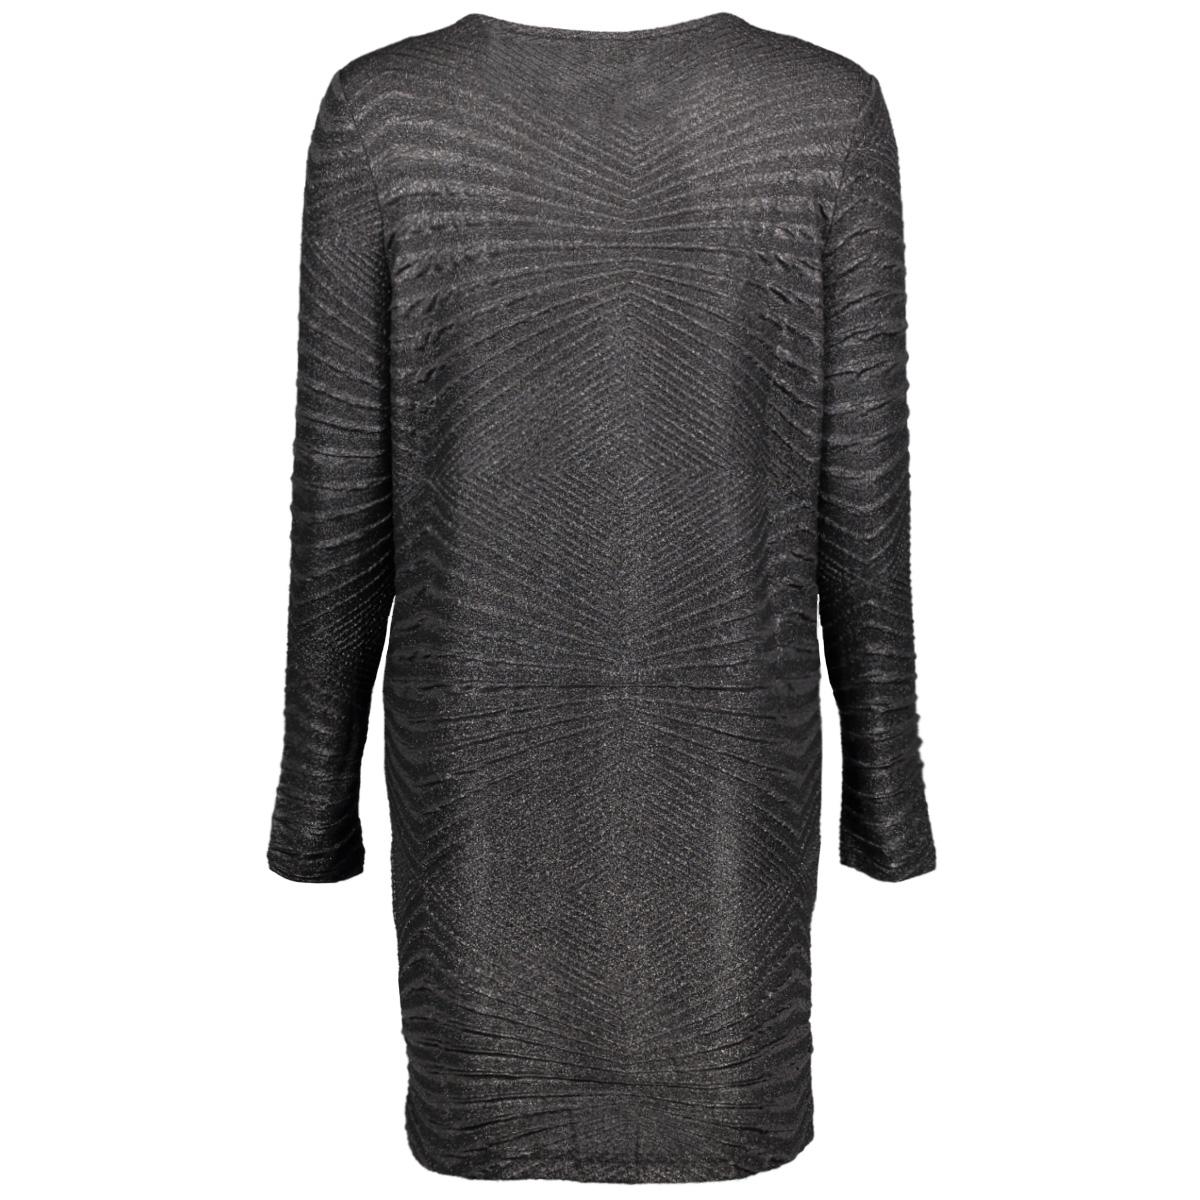 nmcolla heaven l/s boxy dress x 27001495 noisy may jurk black